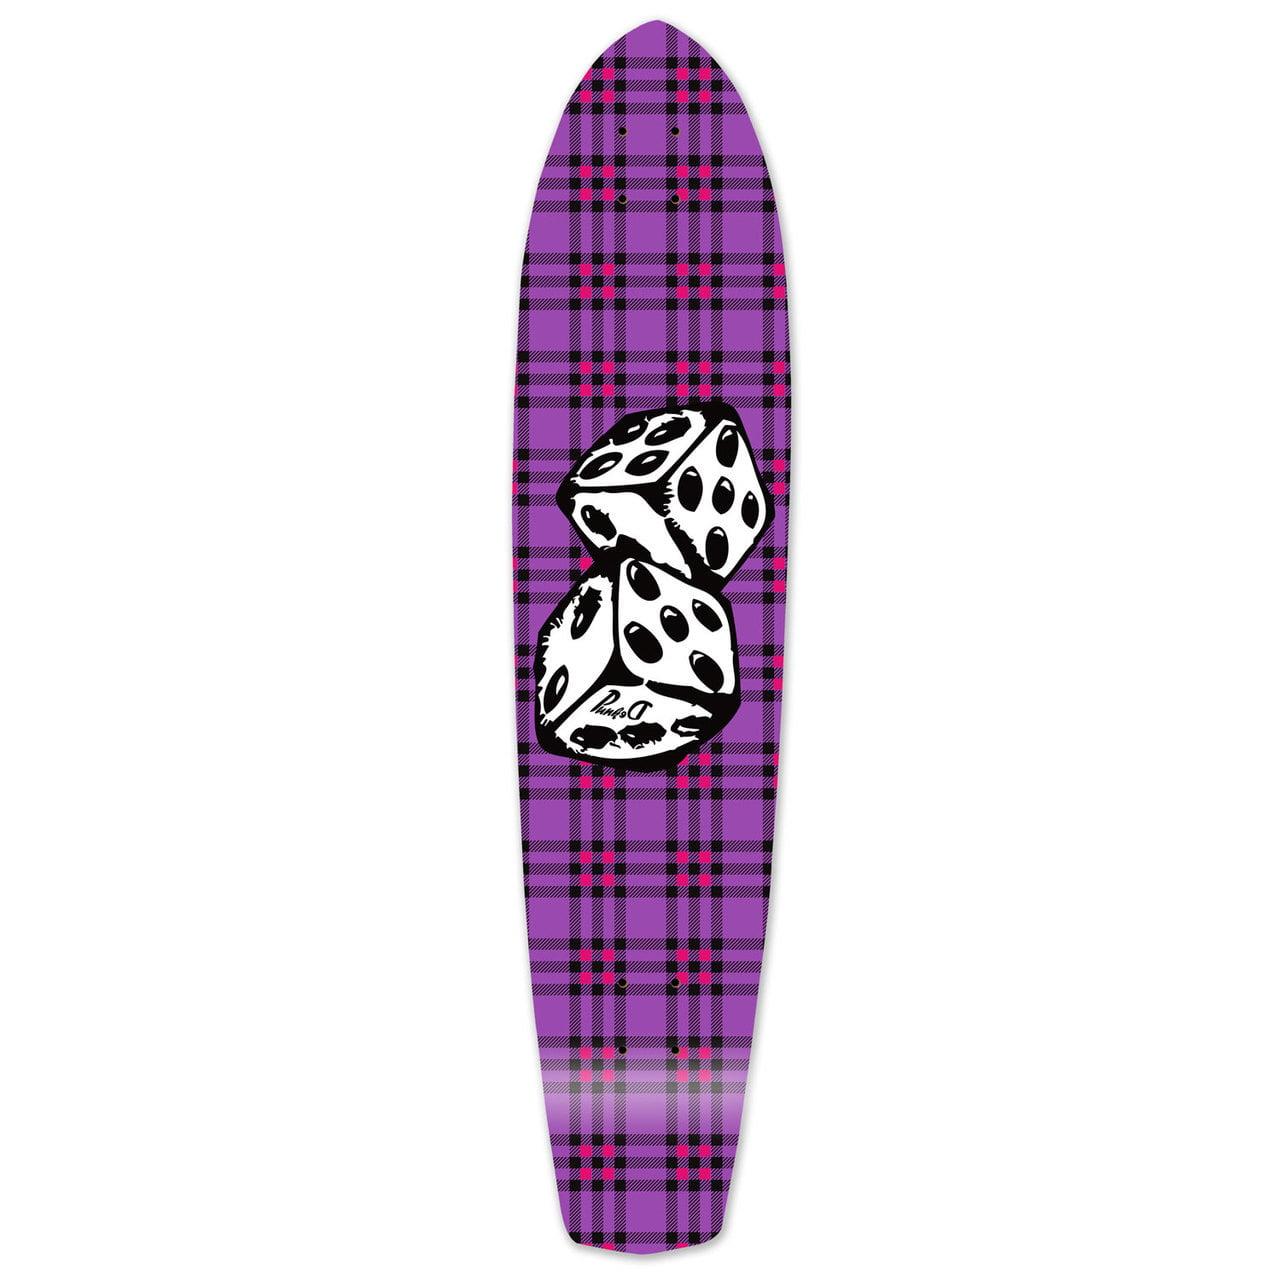 Yocaher Slimkick Longboard Deck Dice by